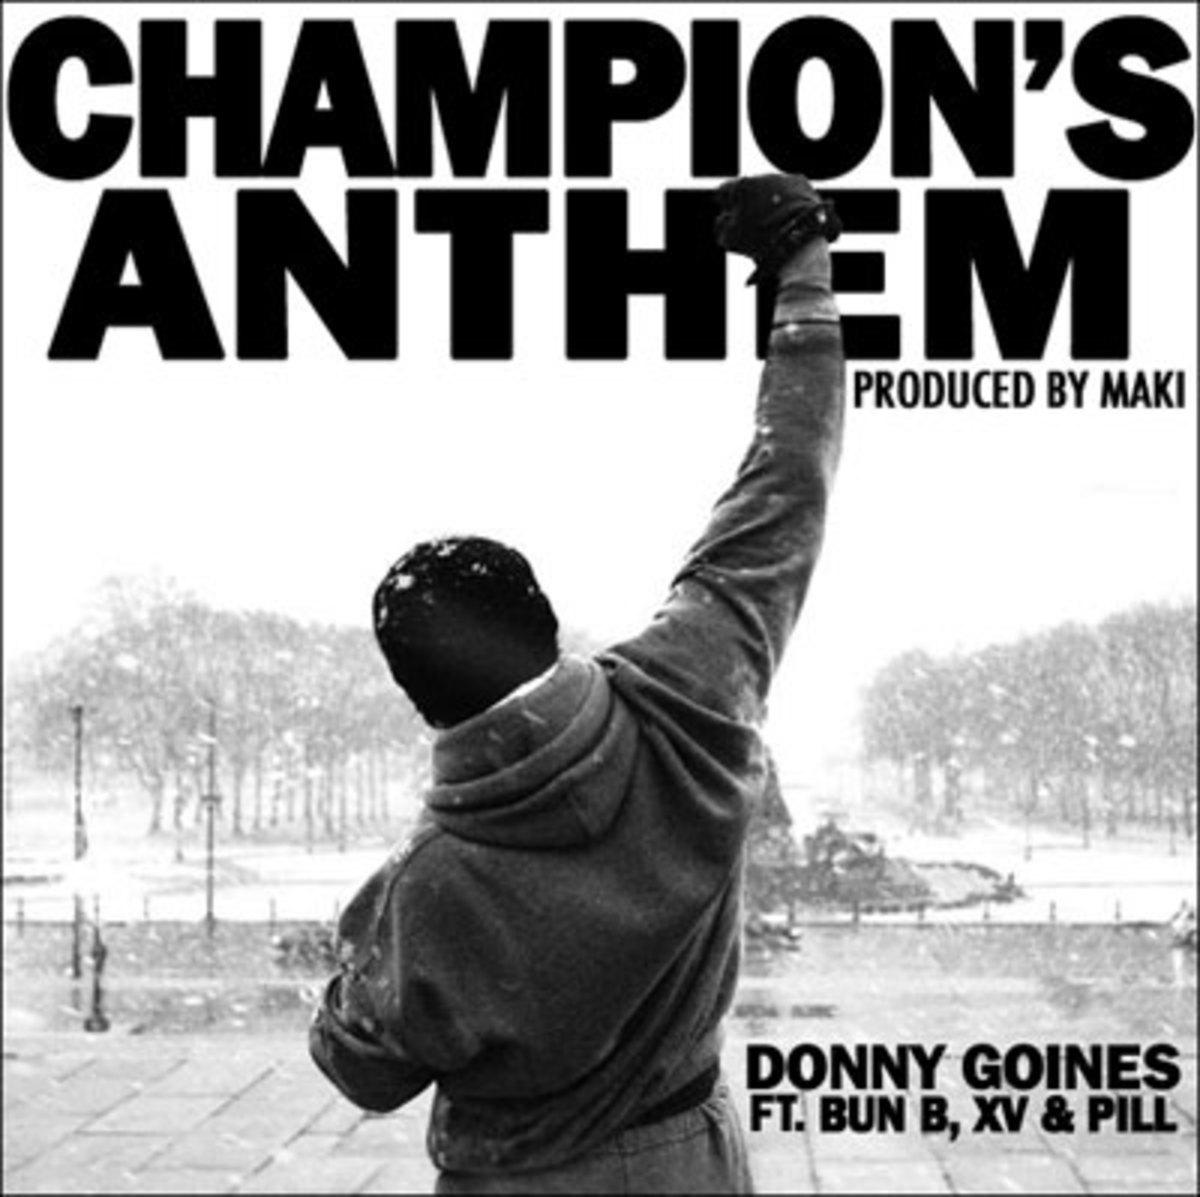 donnygoines-championsanthem.jpg